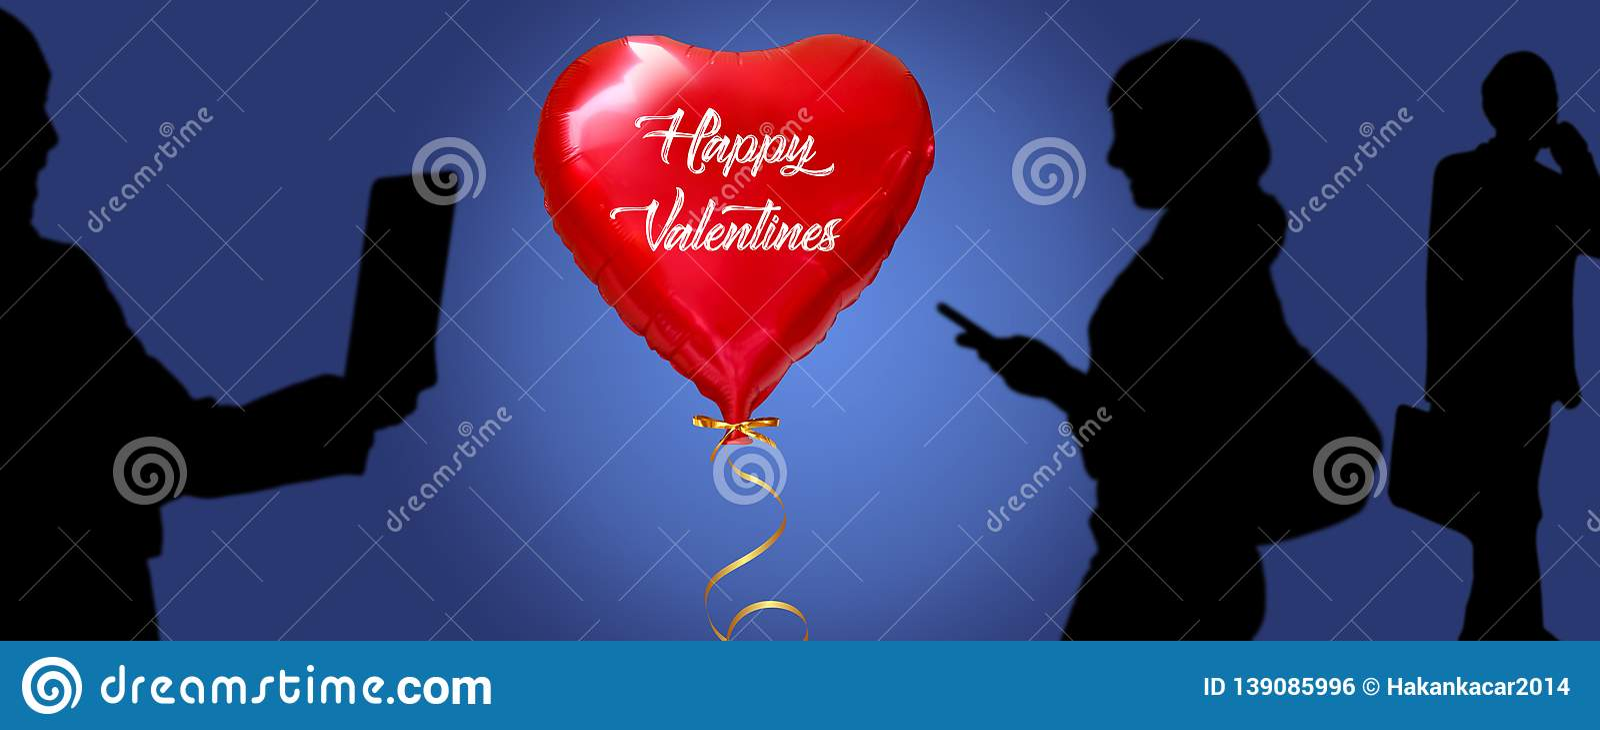 Social media, Baloon, Valentines day.